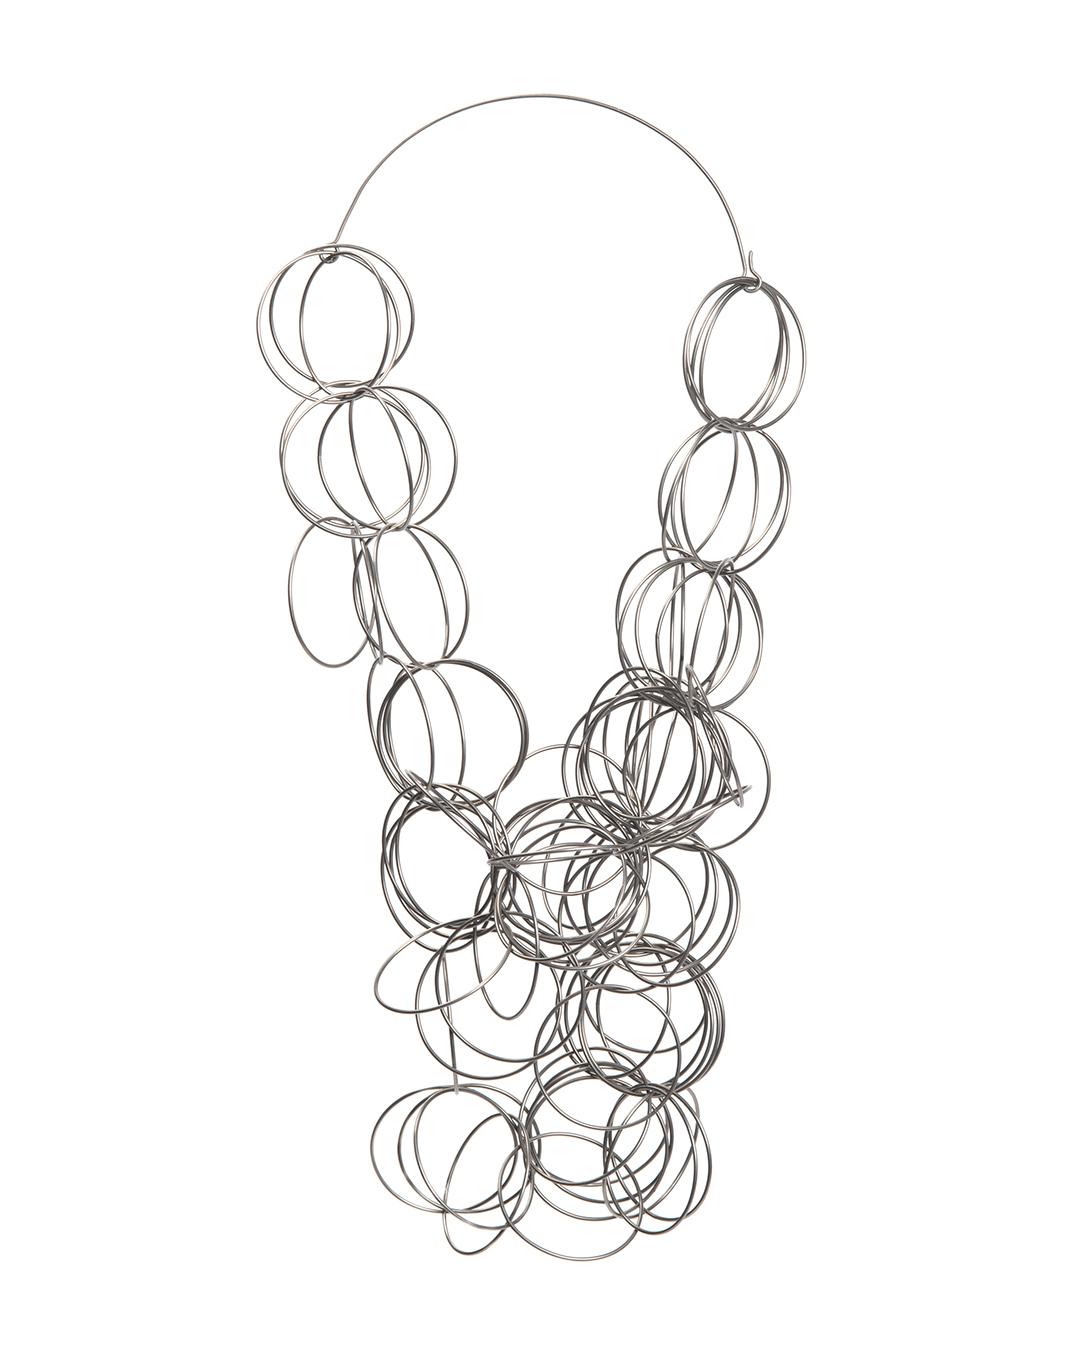 Klára Chrudinová, Circles, 2012, necklace; titanium, 410 x 240 x 5 mm